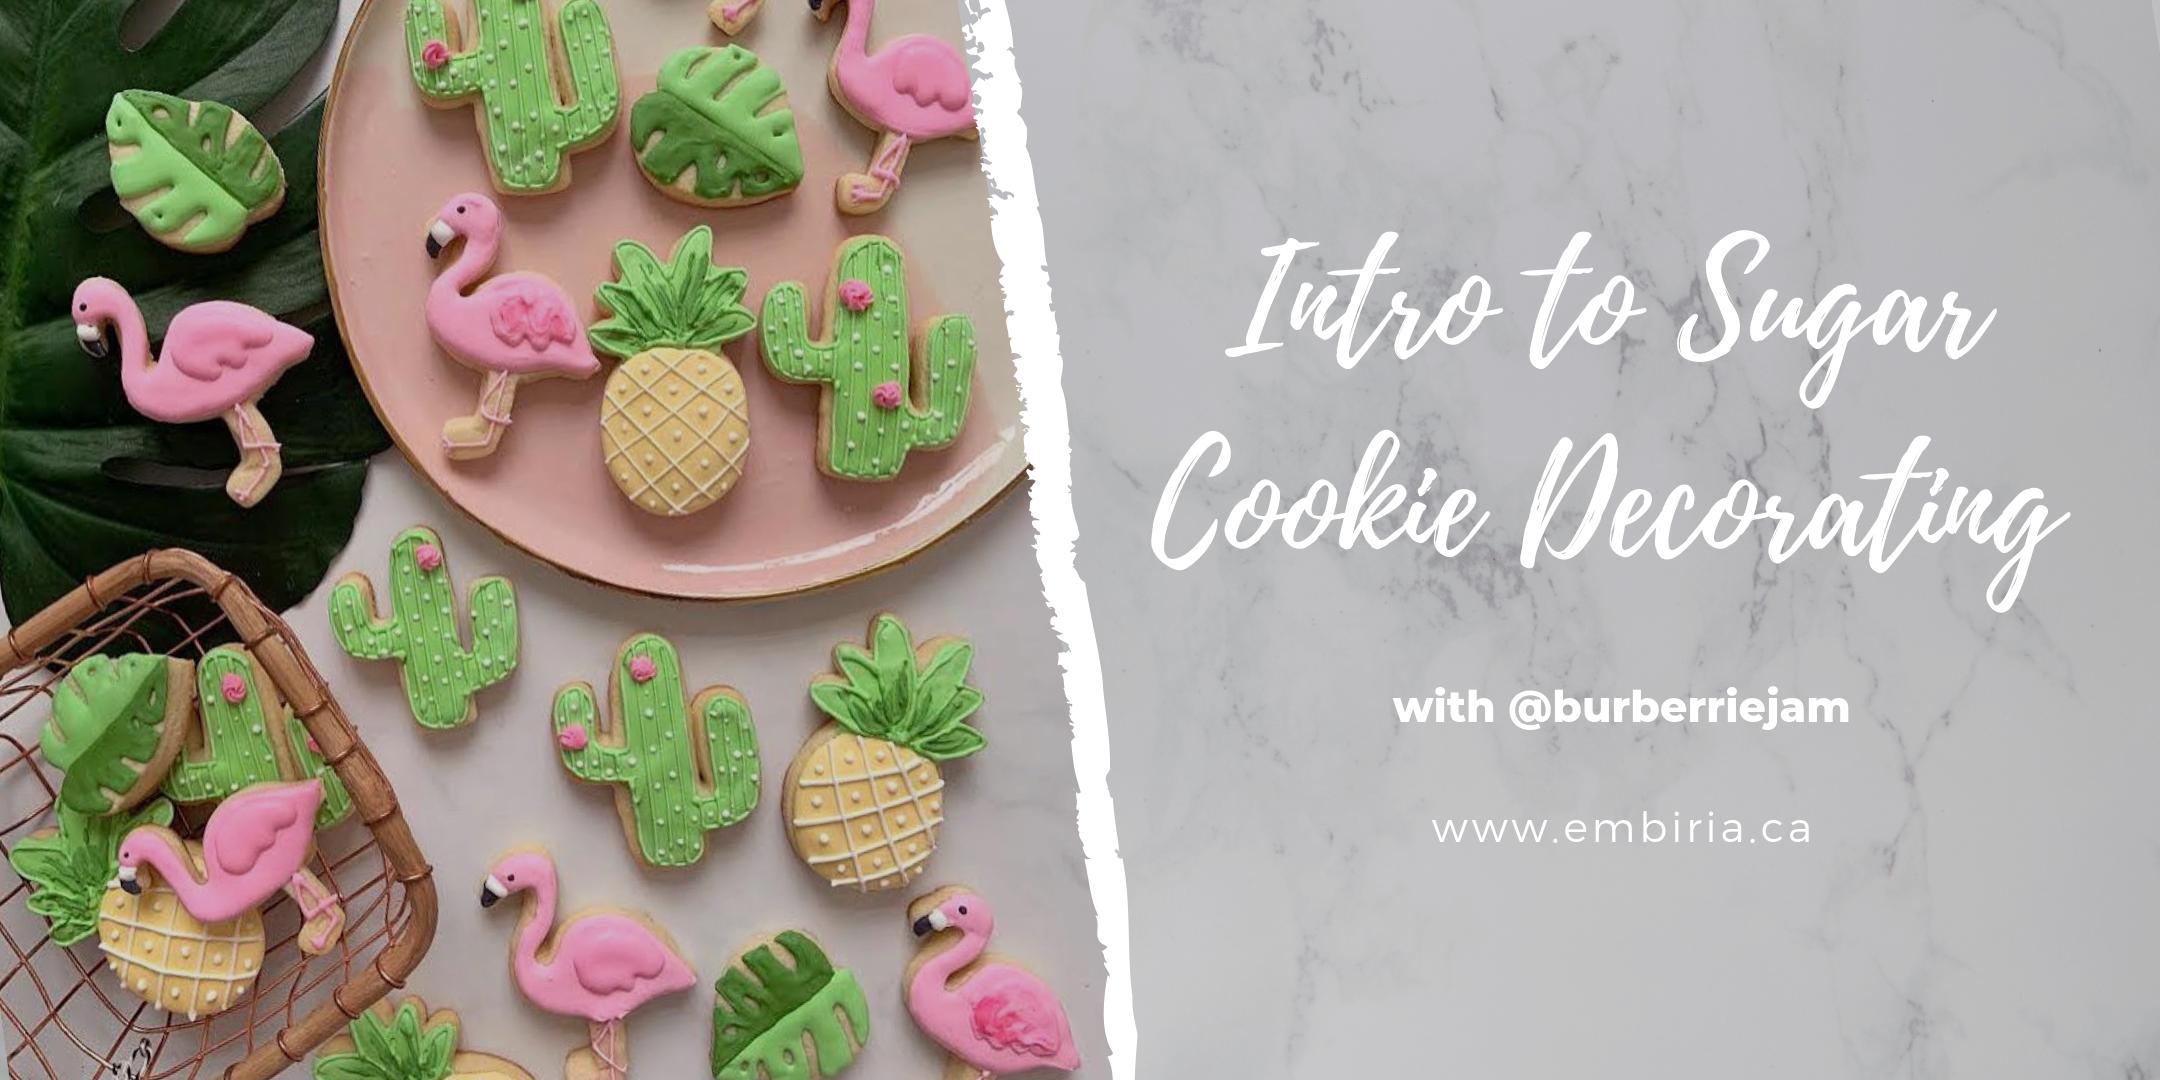 intro to sugar cookie decorating class toronto